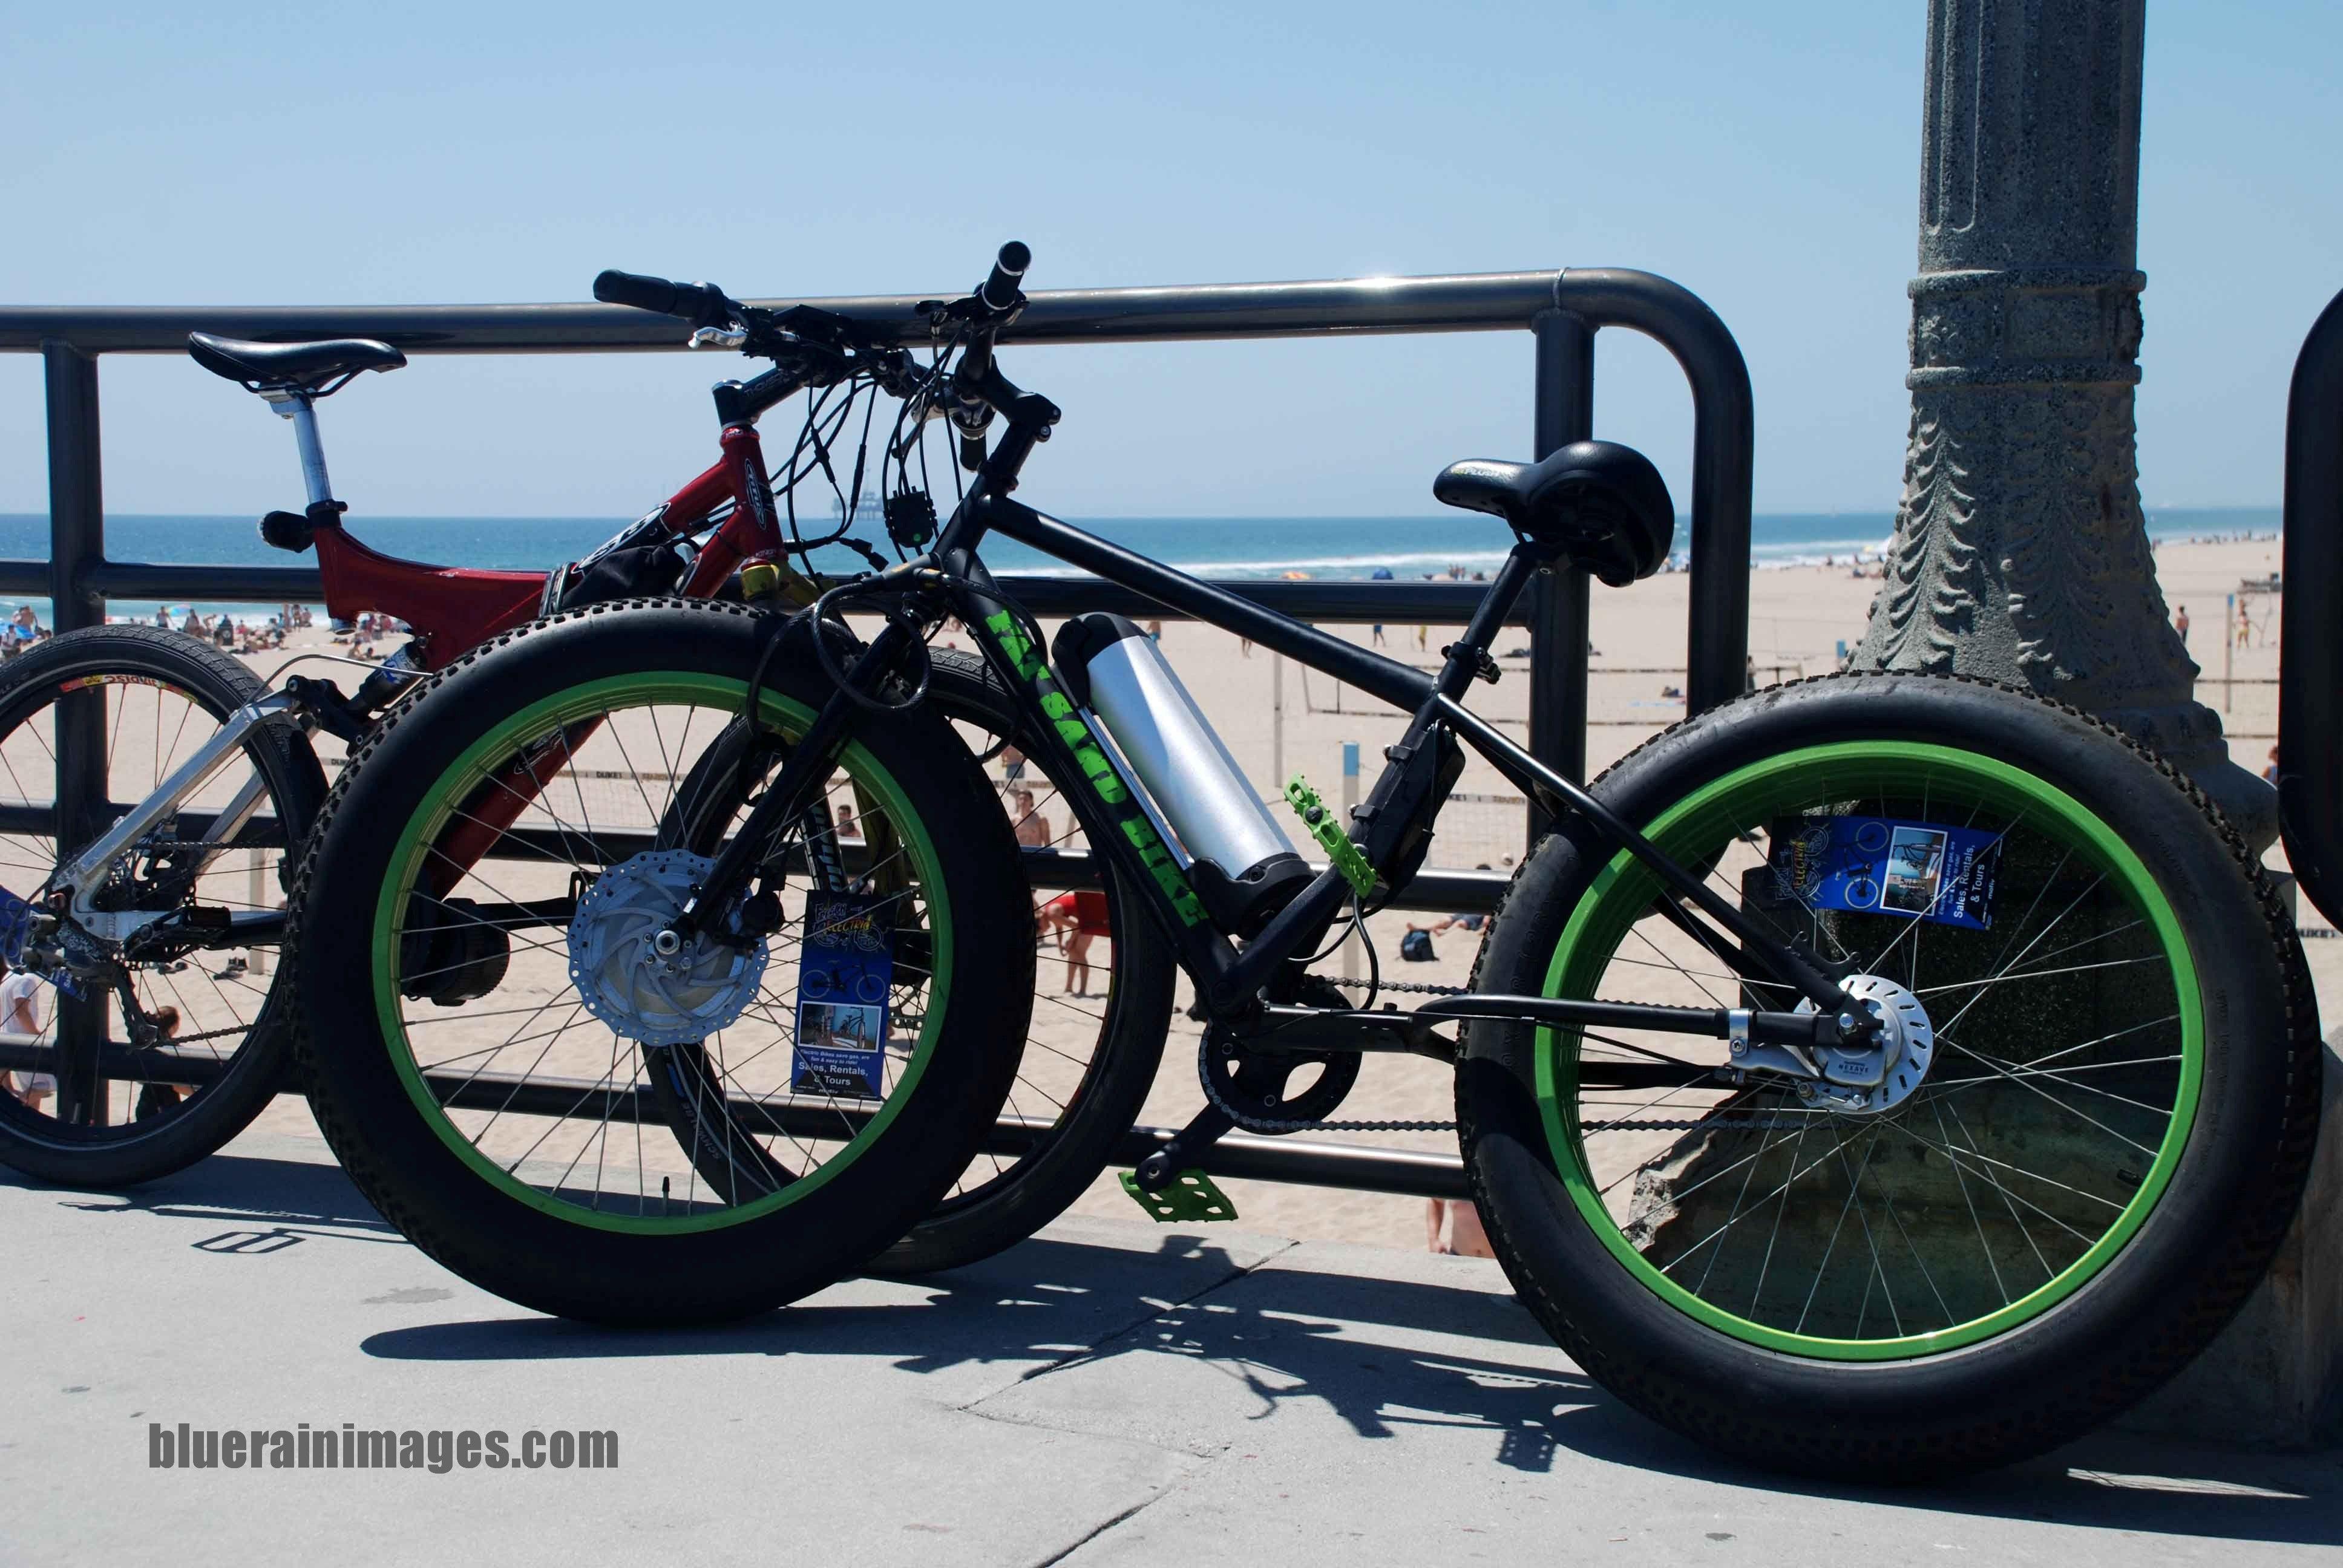 Bikes huntington beach pier photo by bluerainimages